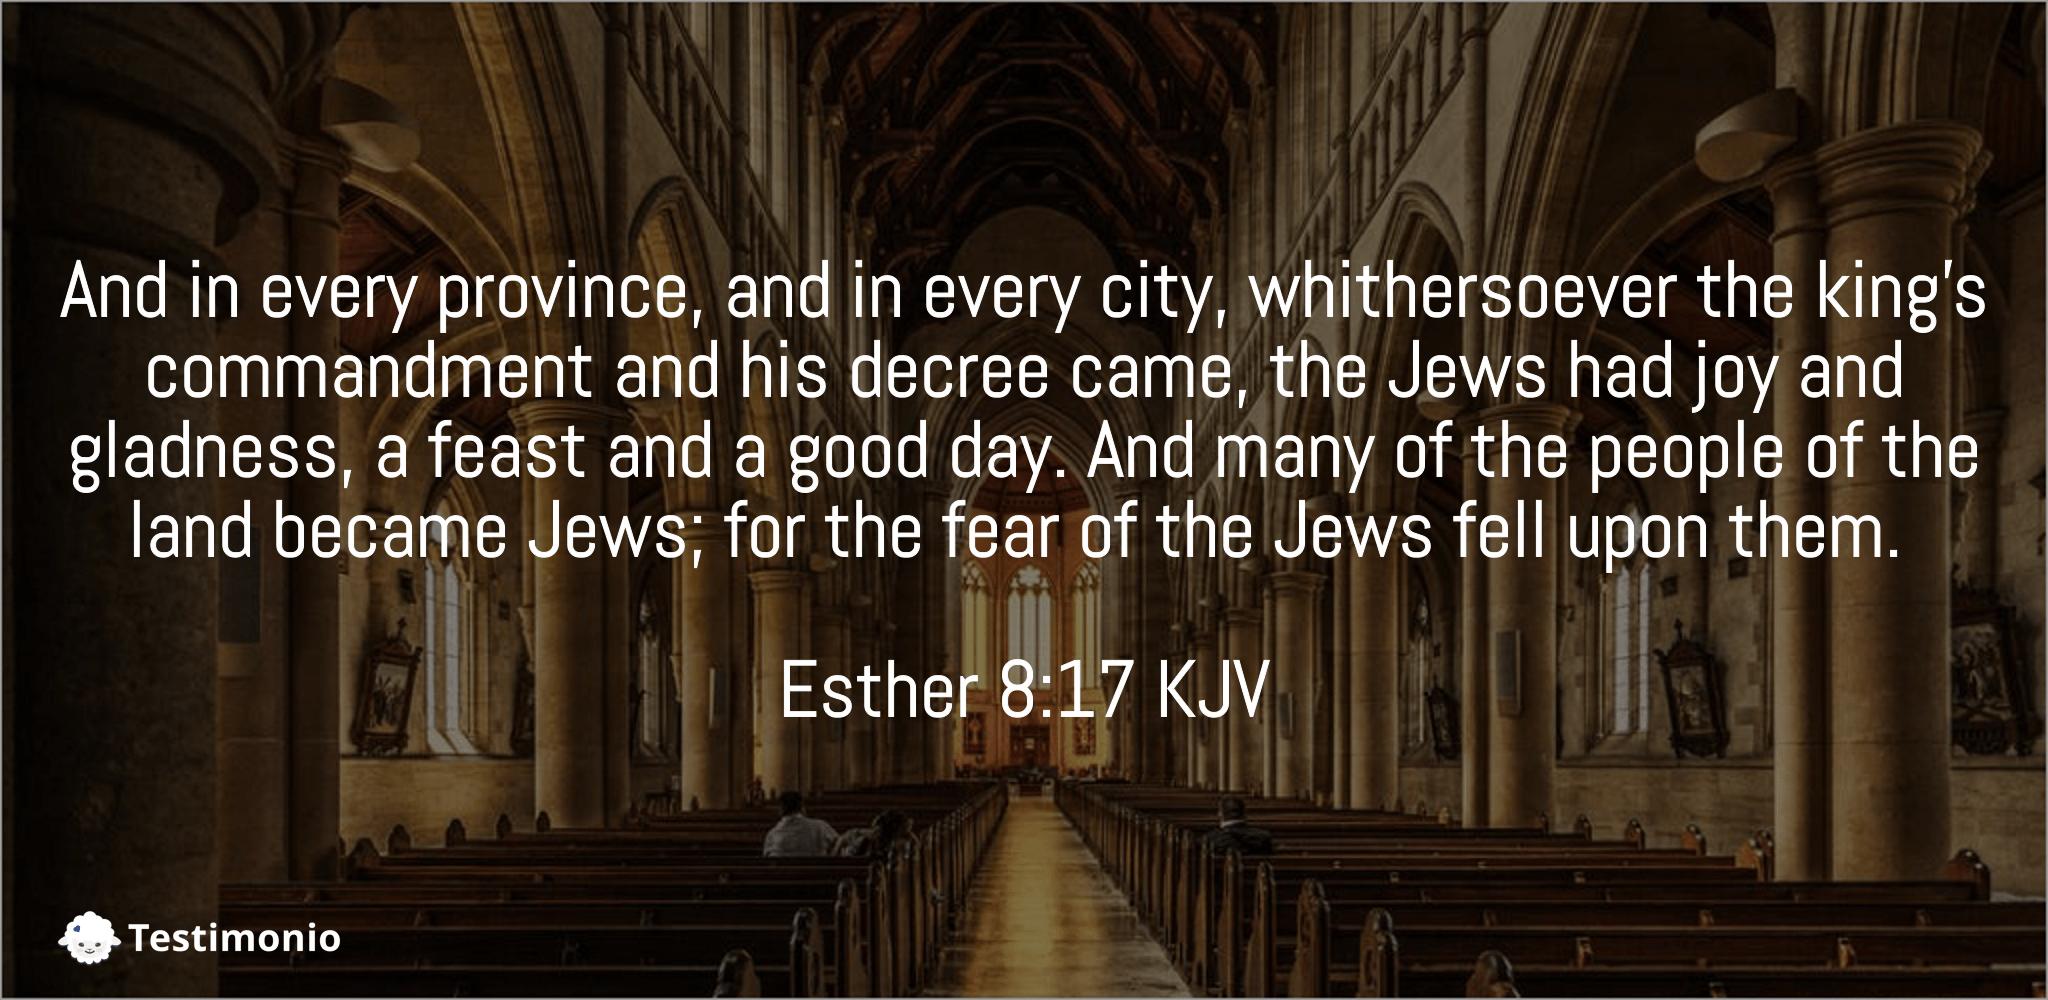 Esther 8:17